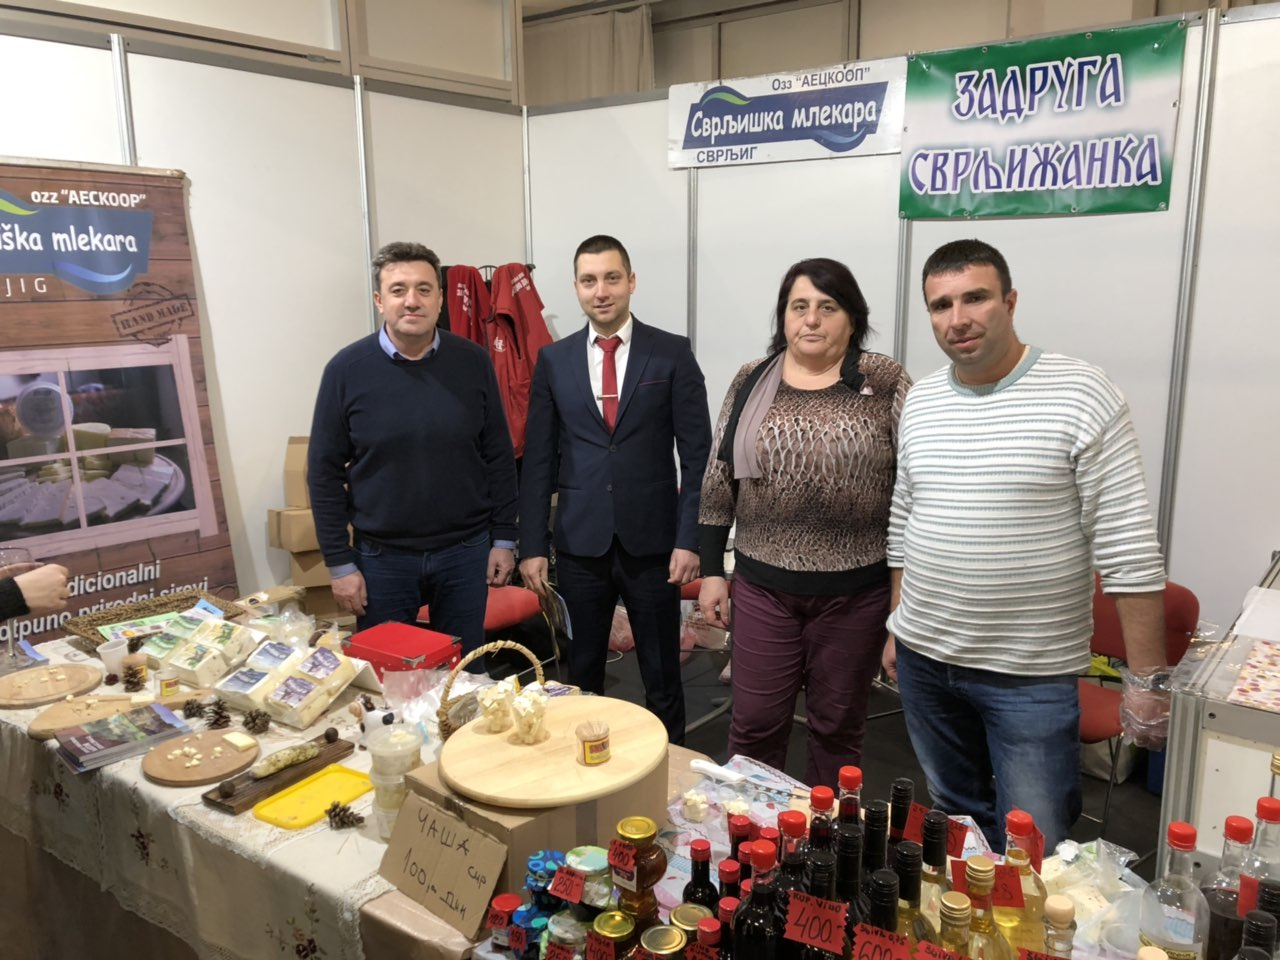 Miroslav Marković na štandu ZZ ,,Svrljižanka'' i mlekare ,,Aeckop''